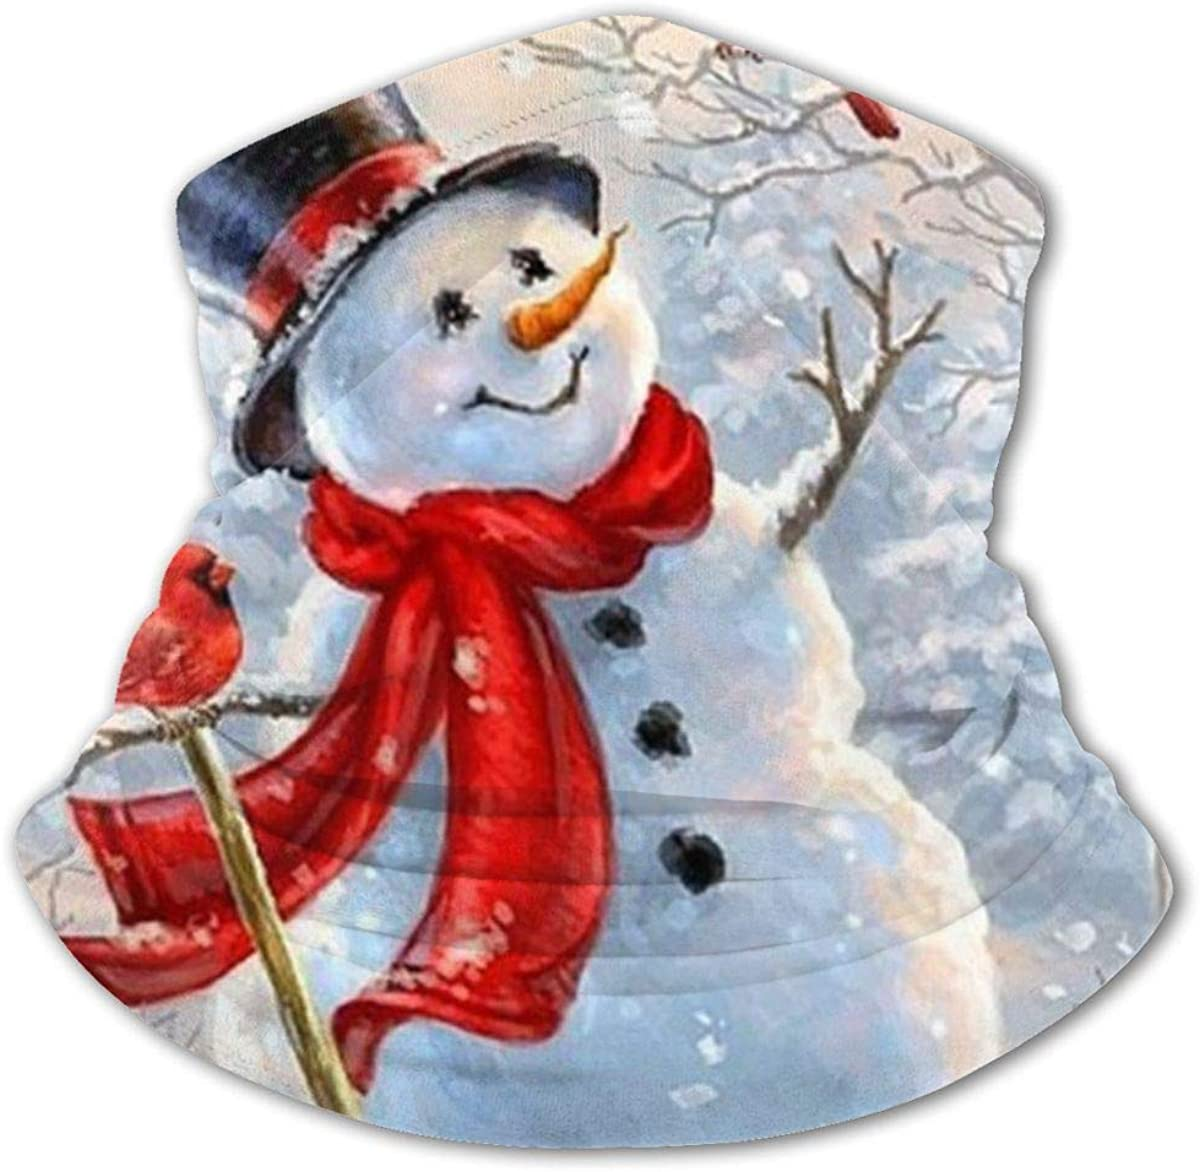 Snowman Bird Headwear For Girls And Boys, Head Wrap, Neck Gaiter, Headband, Tenn Fishing Mask, Magic Scarf, Tube Mask, Face Bandana Mask For Camping Running Cycling